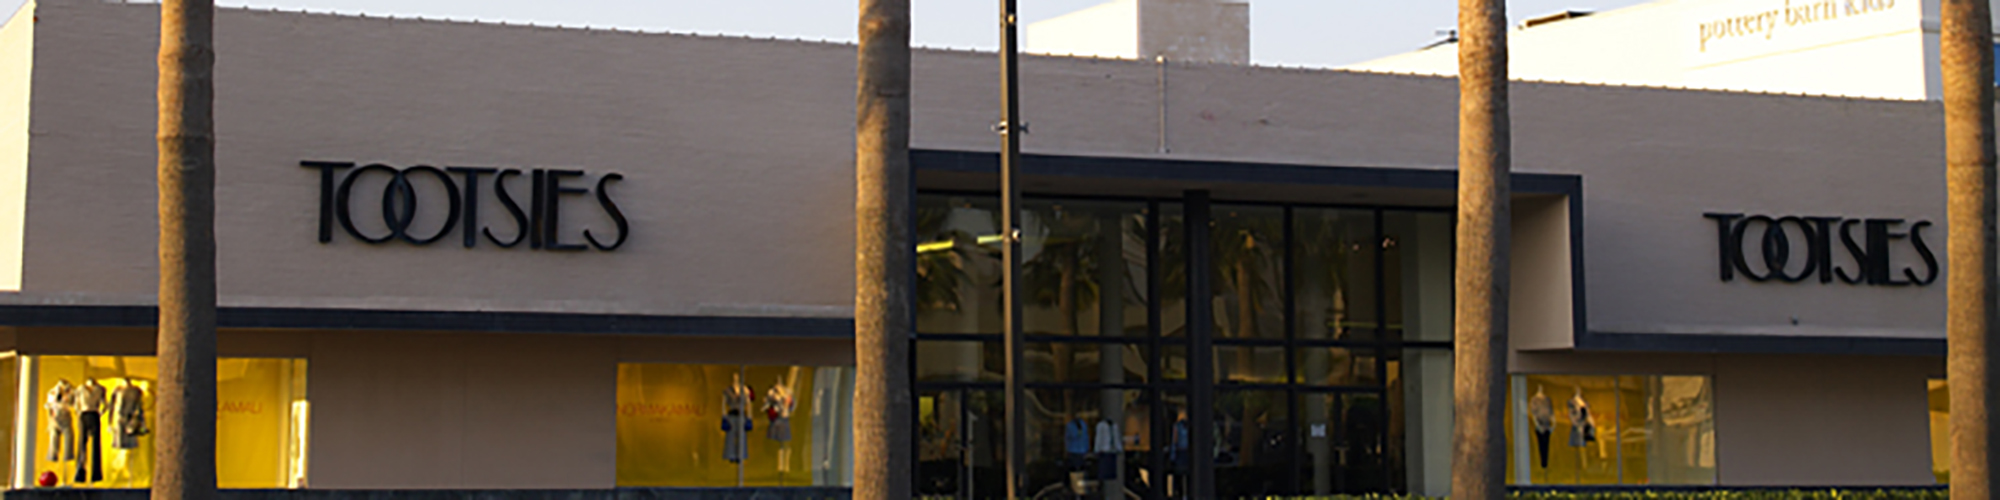 Tootsies Banner Image